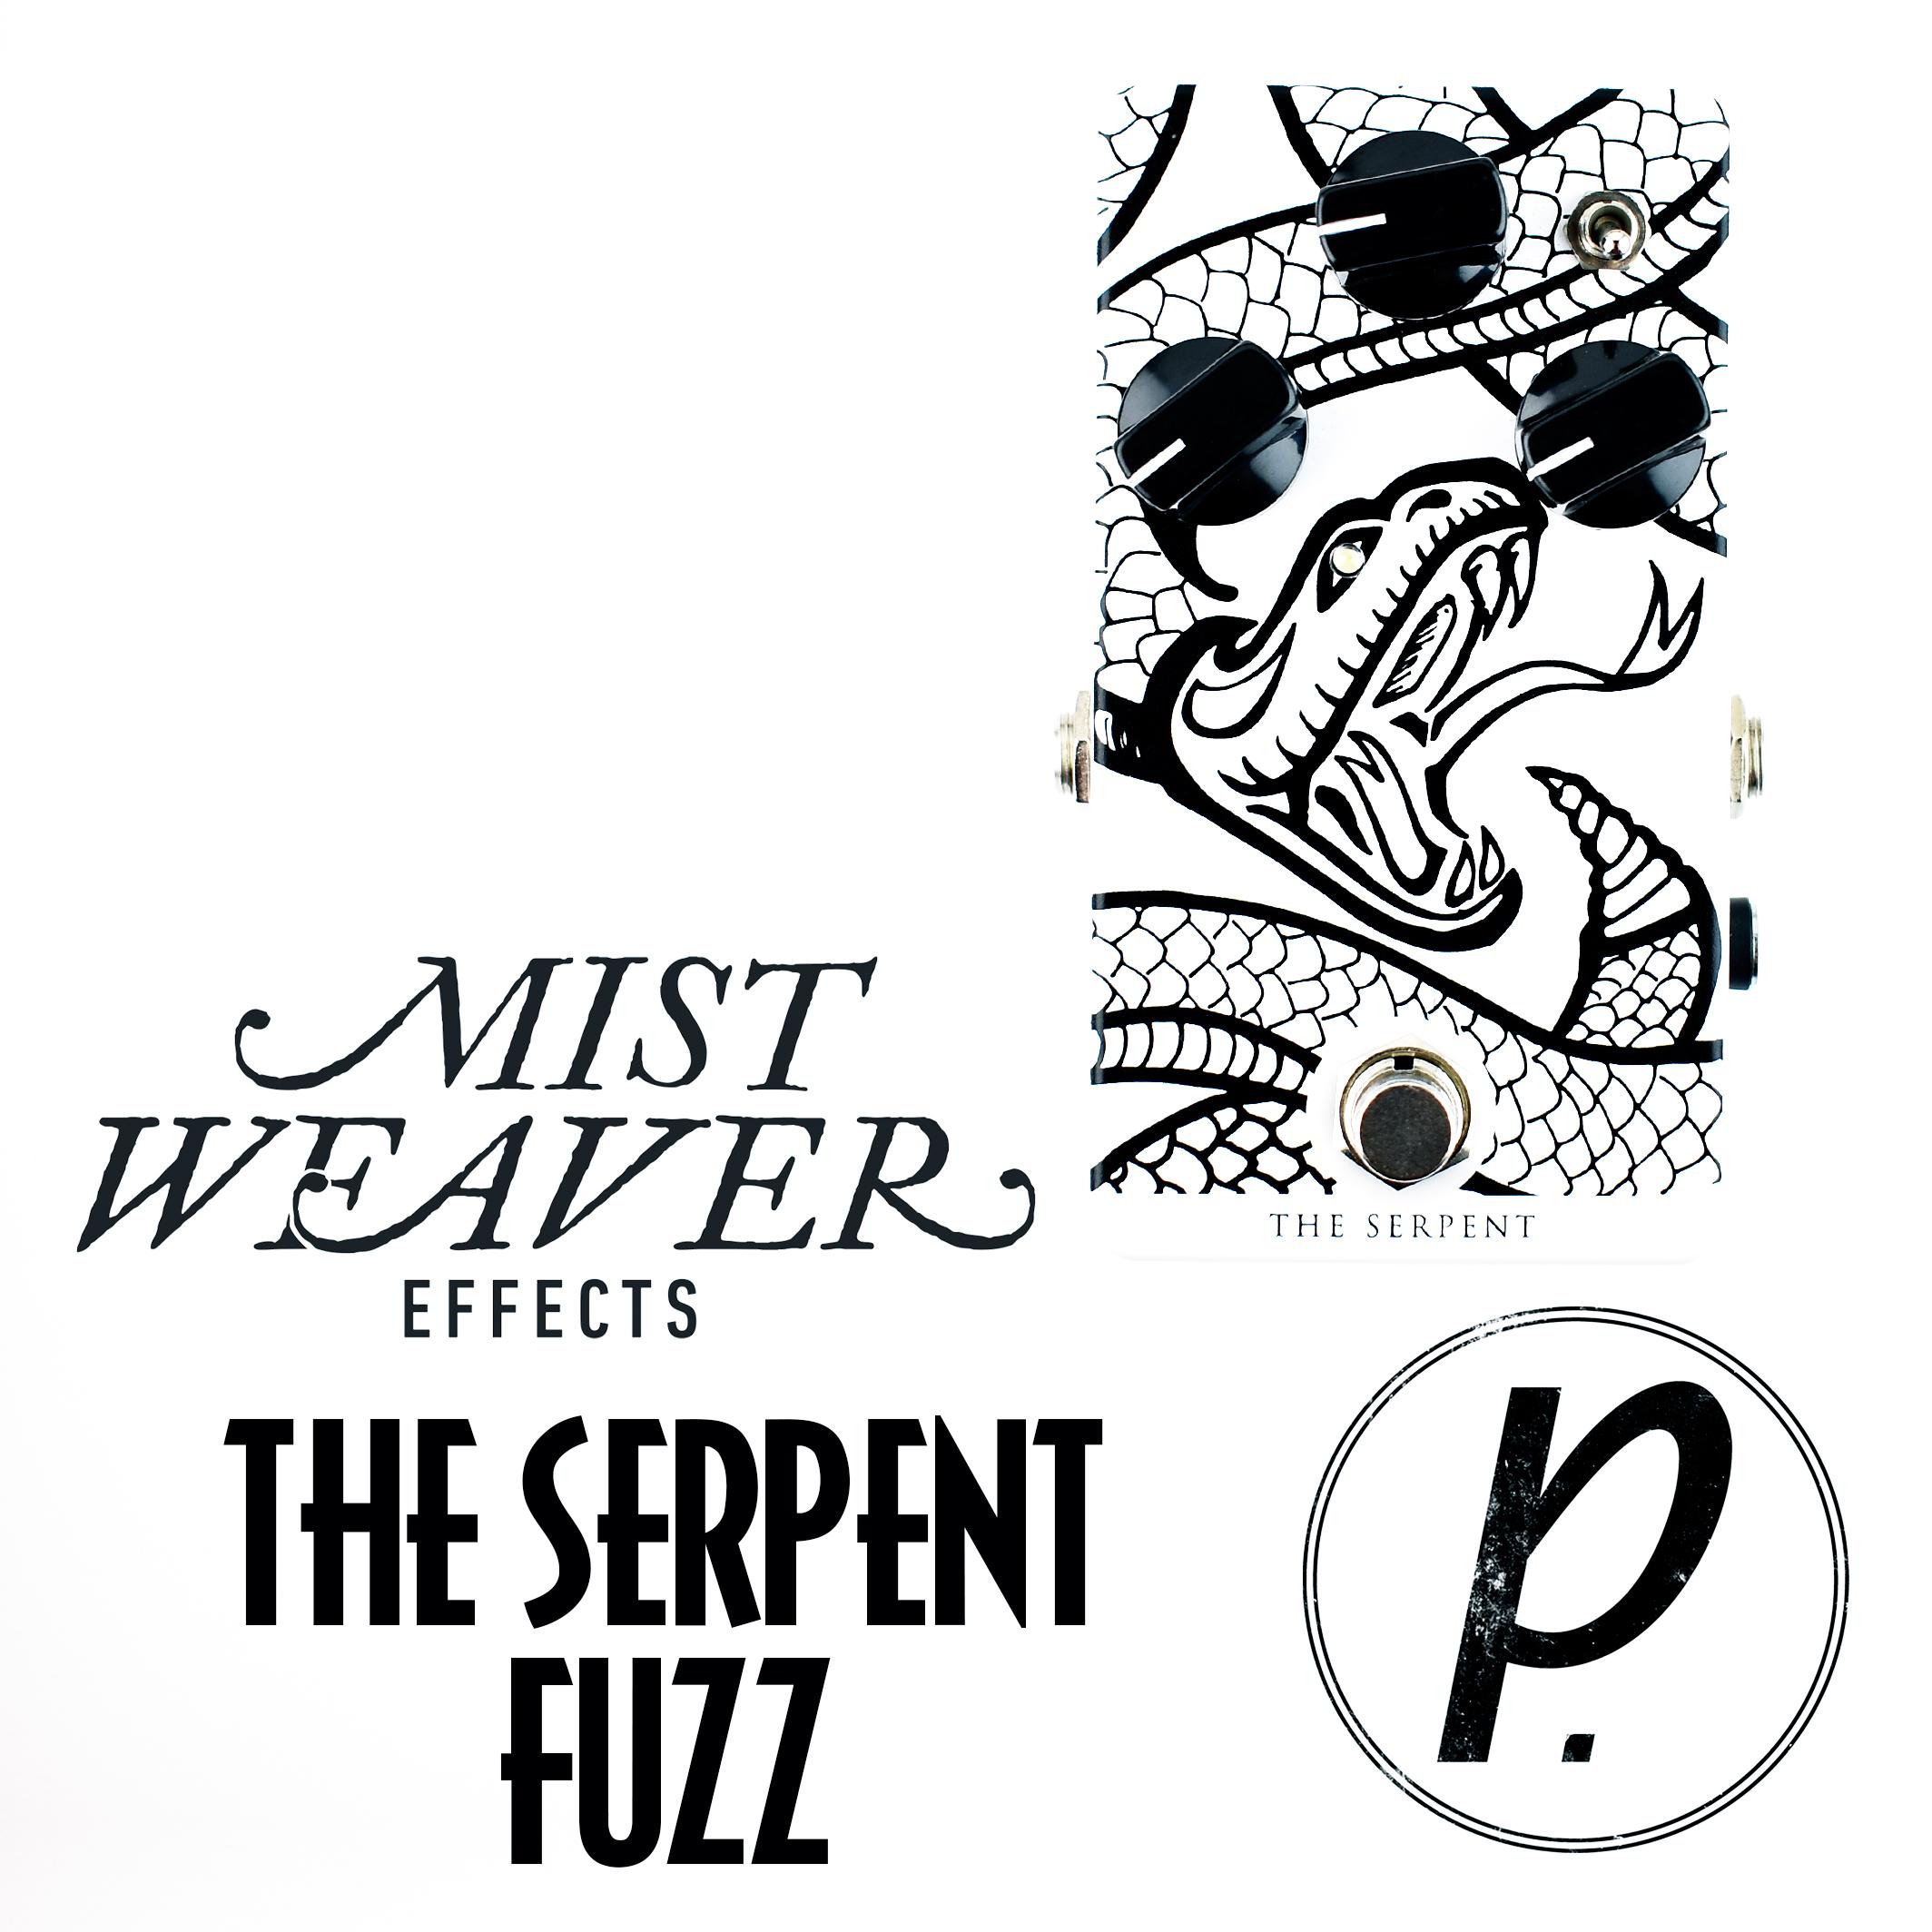 mistweaver effects the serpent fuzz pedal